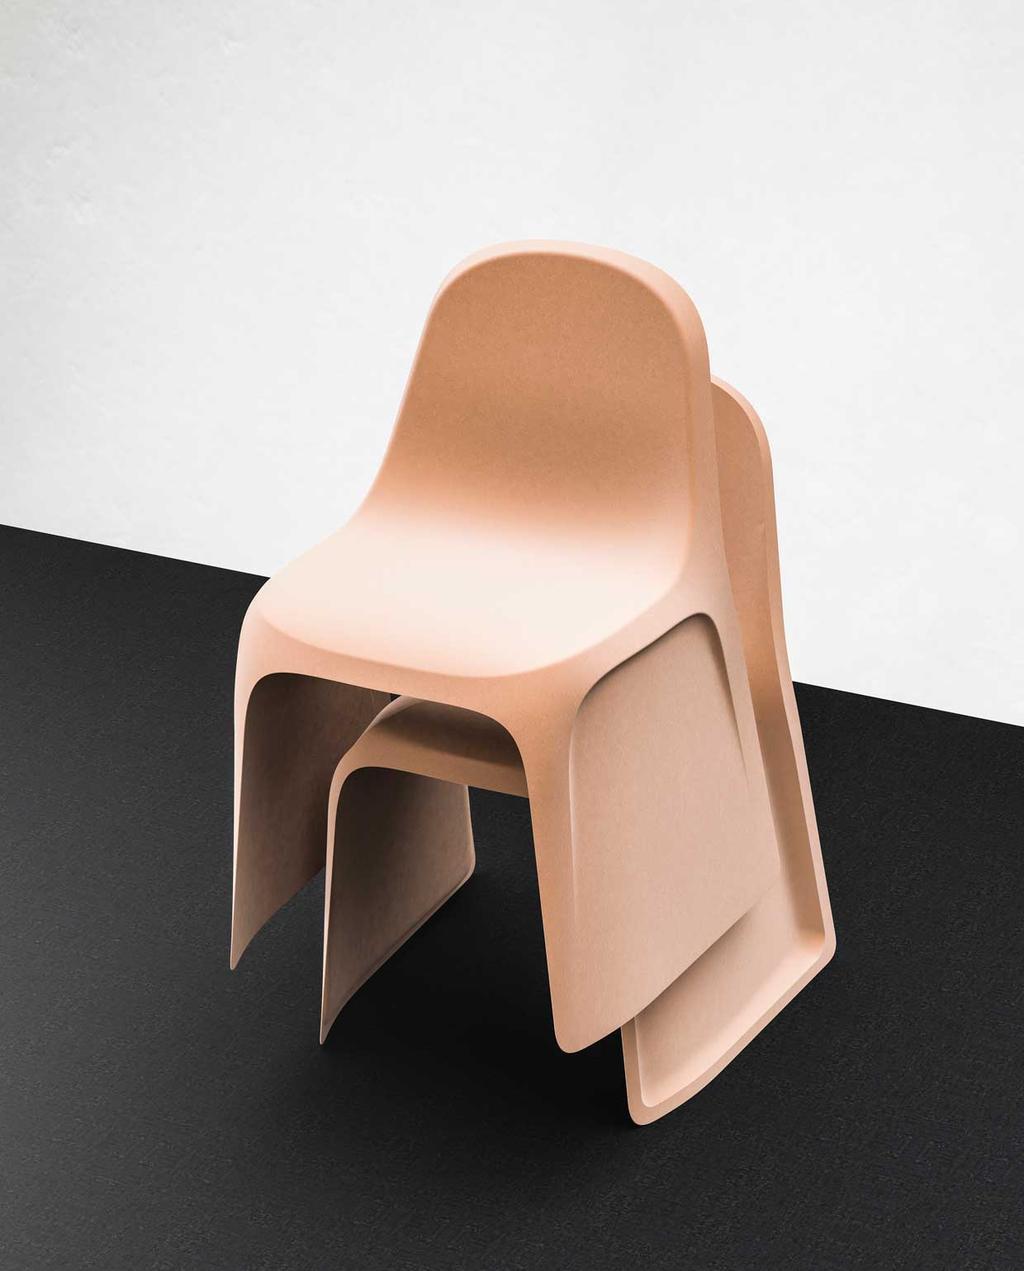 vtwonen blog studentdesign | stoel van karton